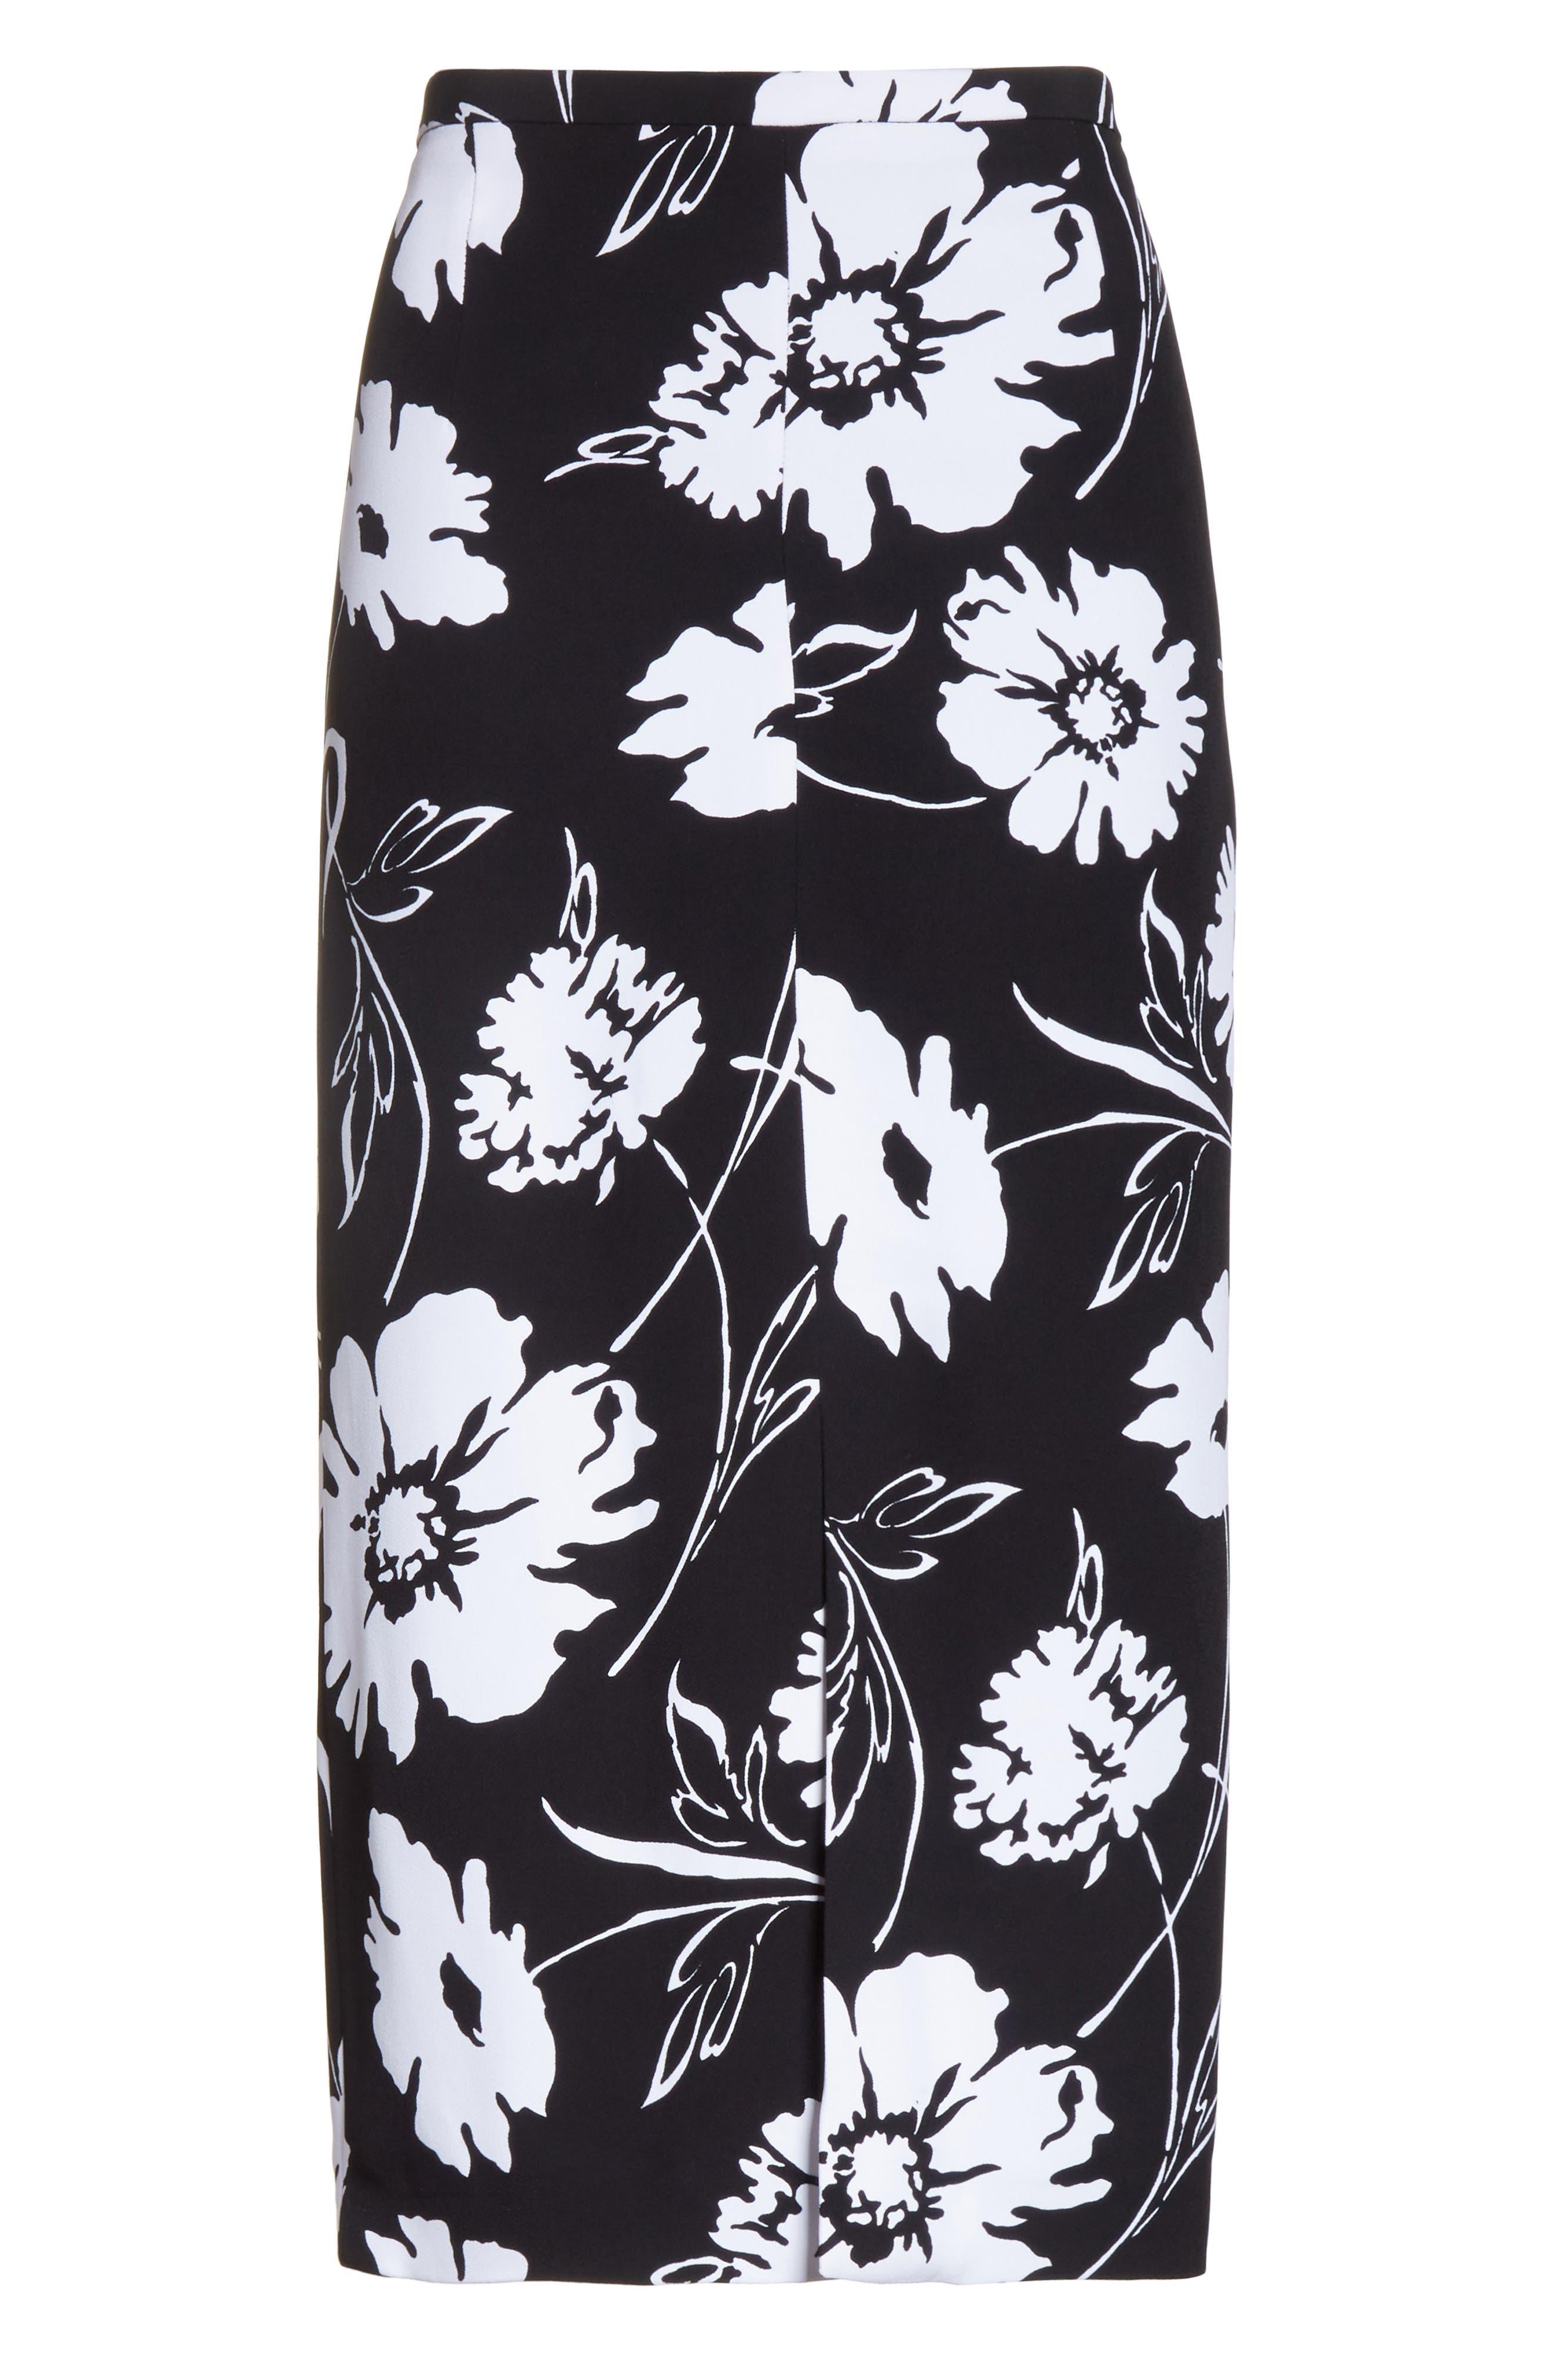 Floral Print Pencil Skirt,                             Alternate thumbnail 6, color,                             Black / White